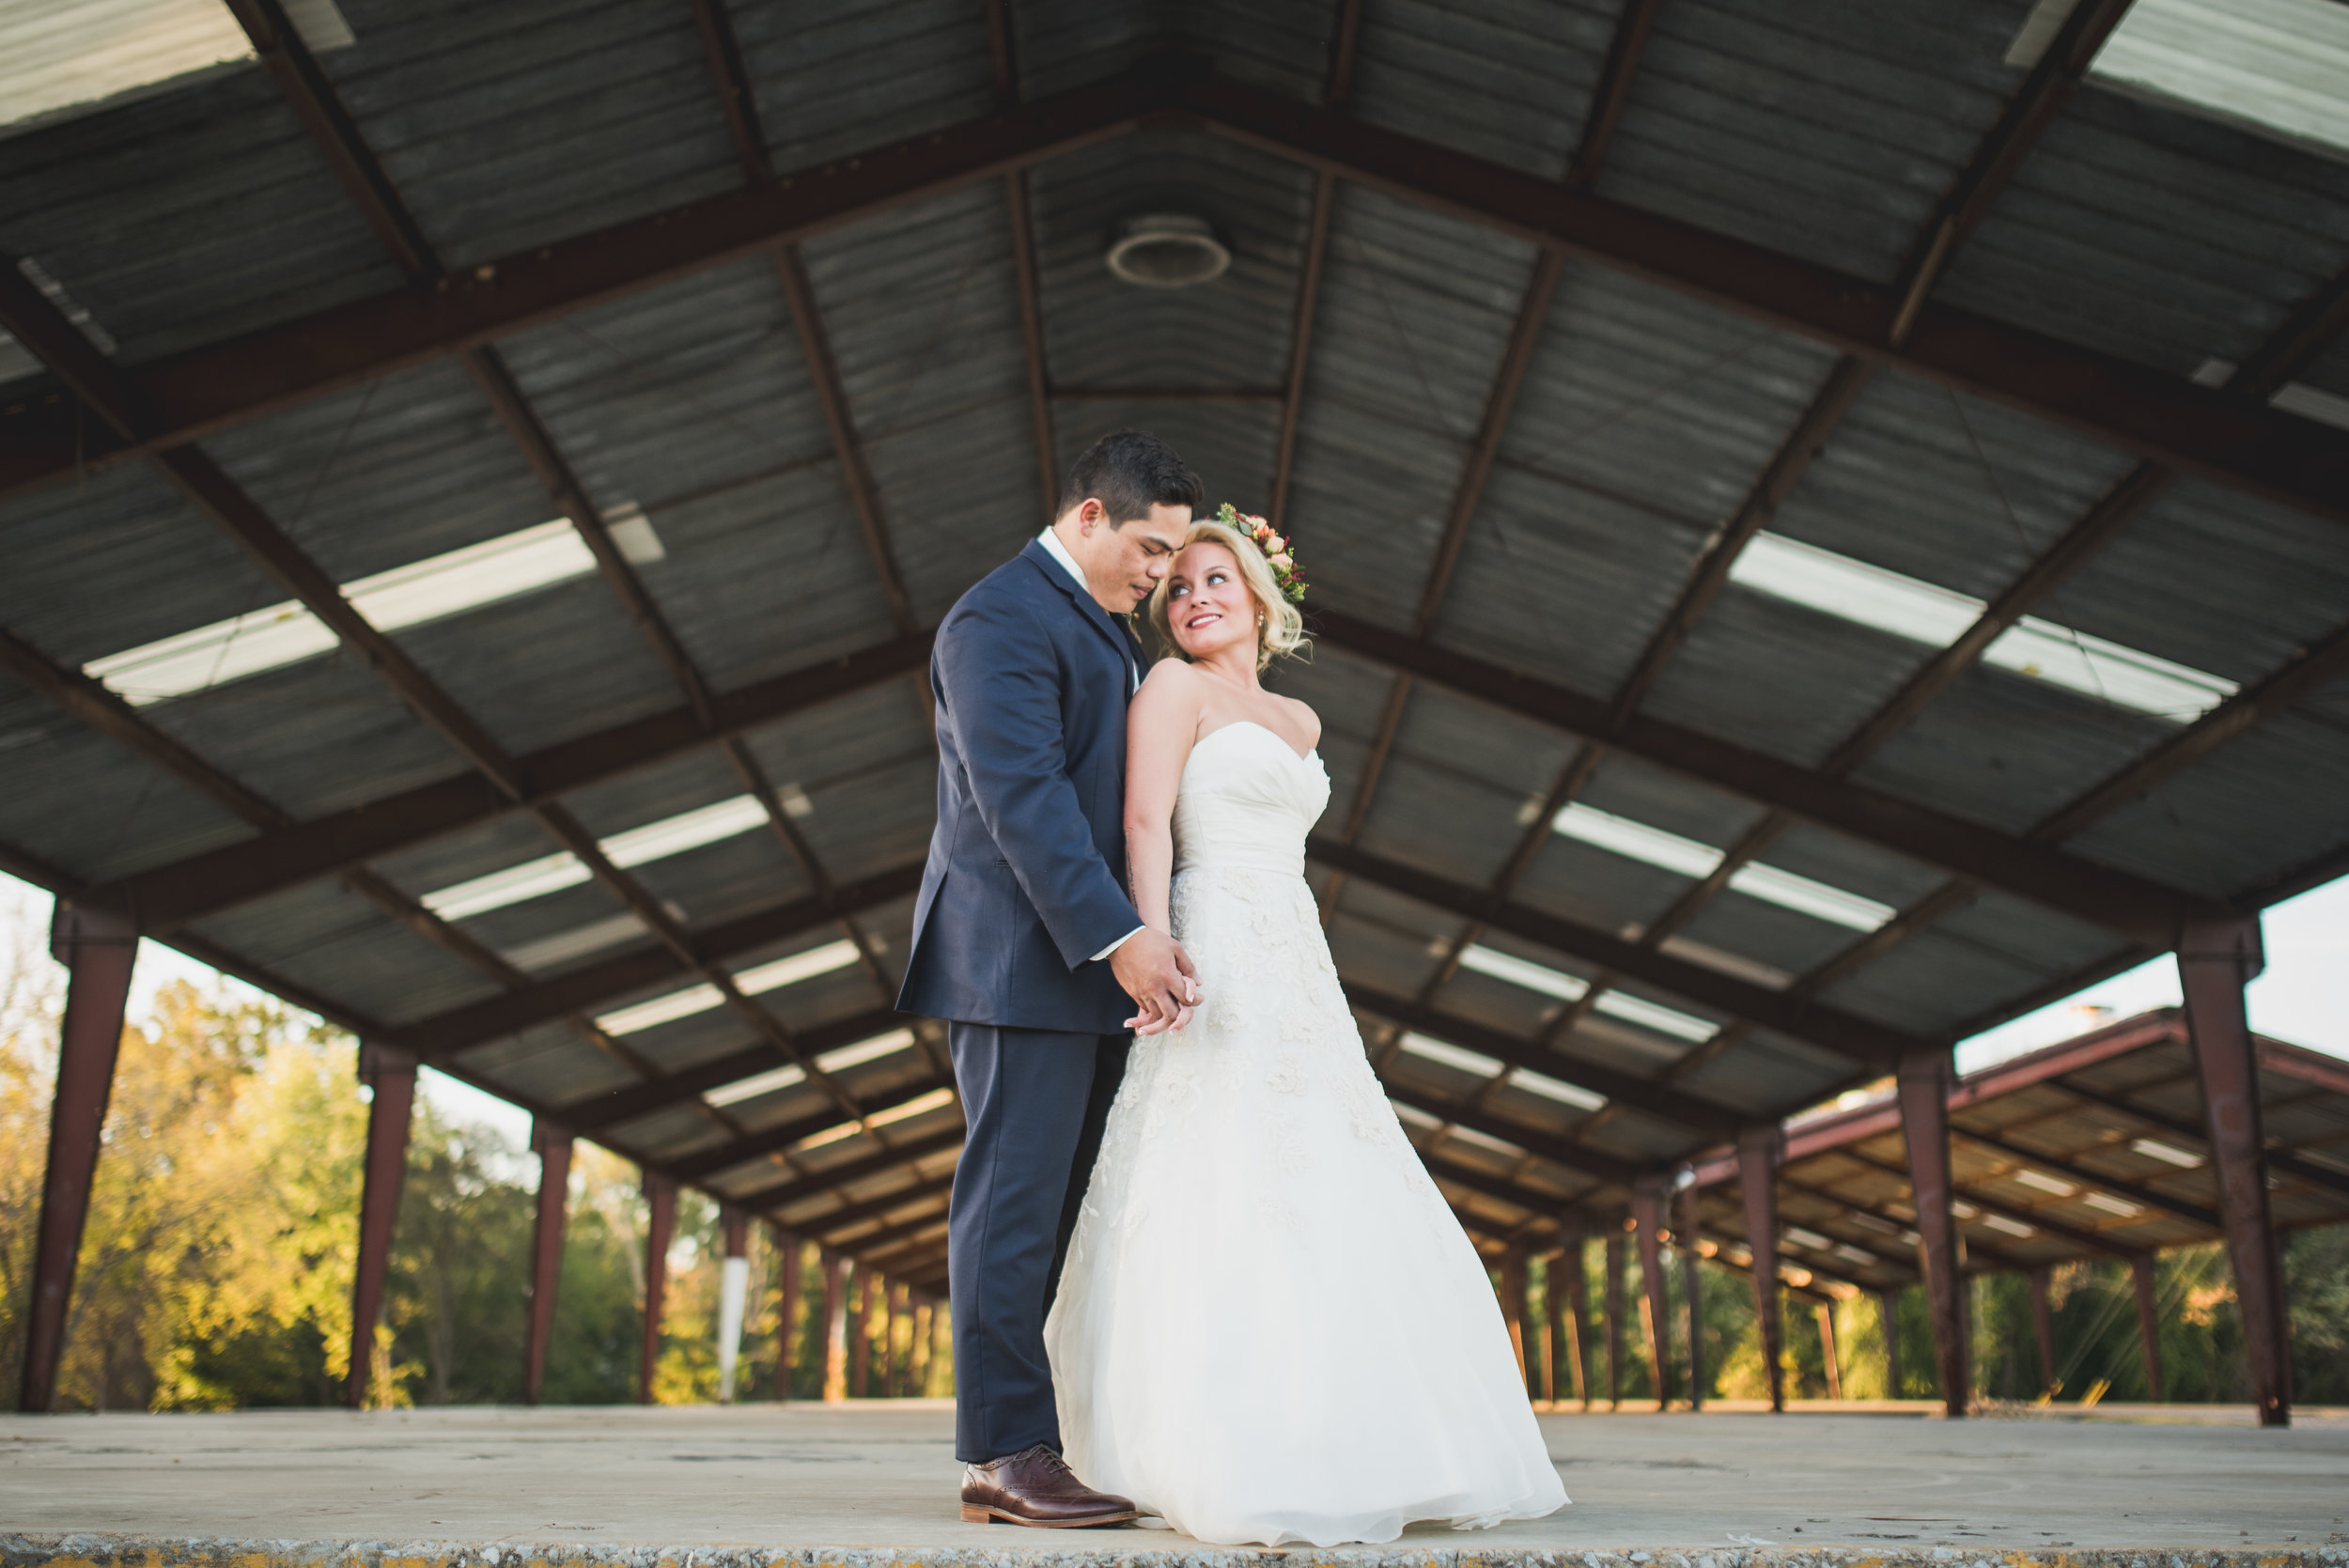 Nashville-wedding-photographers-CJ's-Off-The-Square-49.JPG